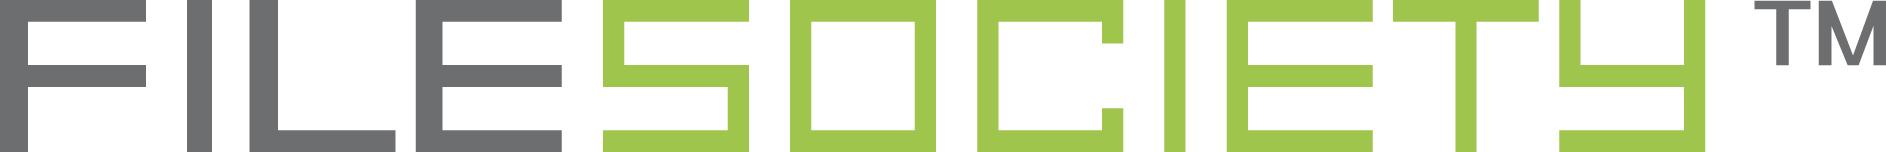 FileSociety Technographics